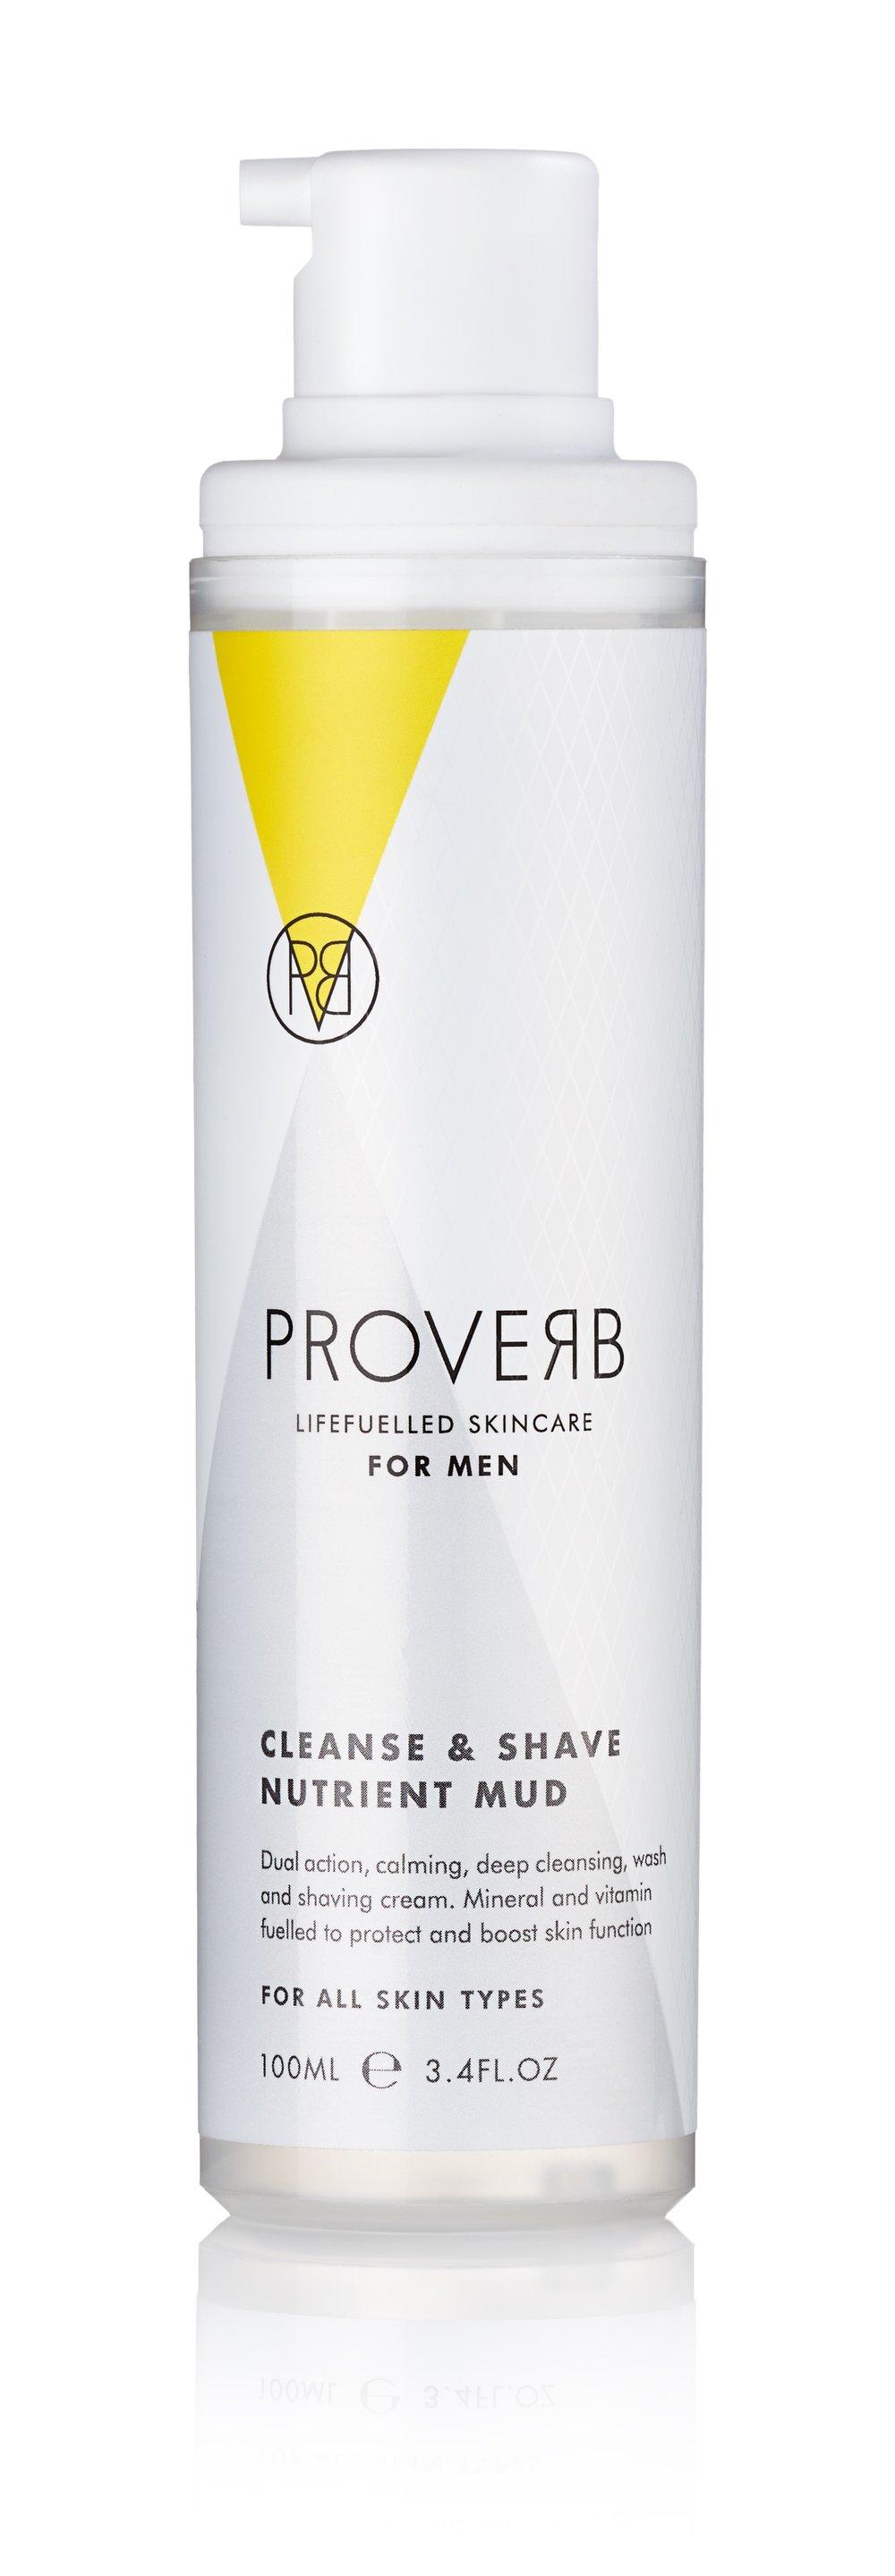 Cleanse & Shave Bottle.jpeg